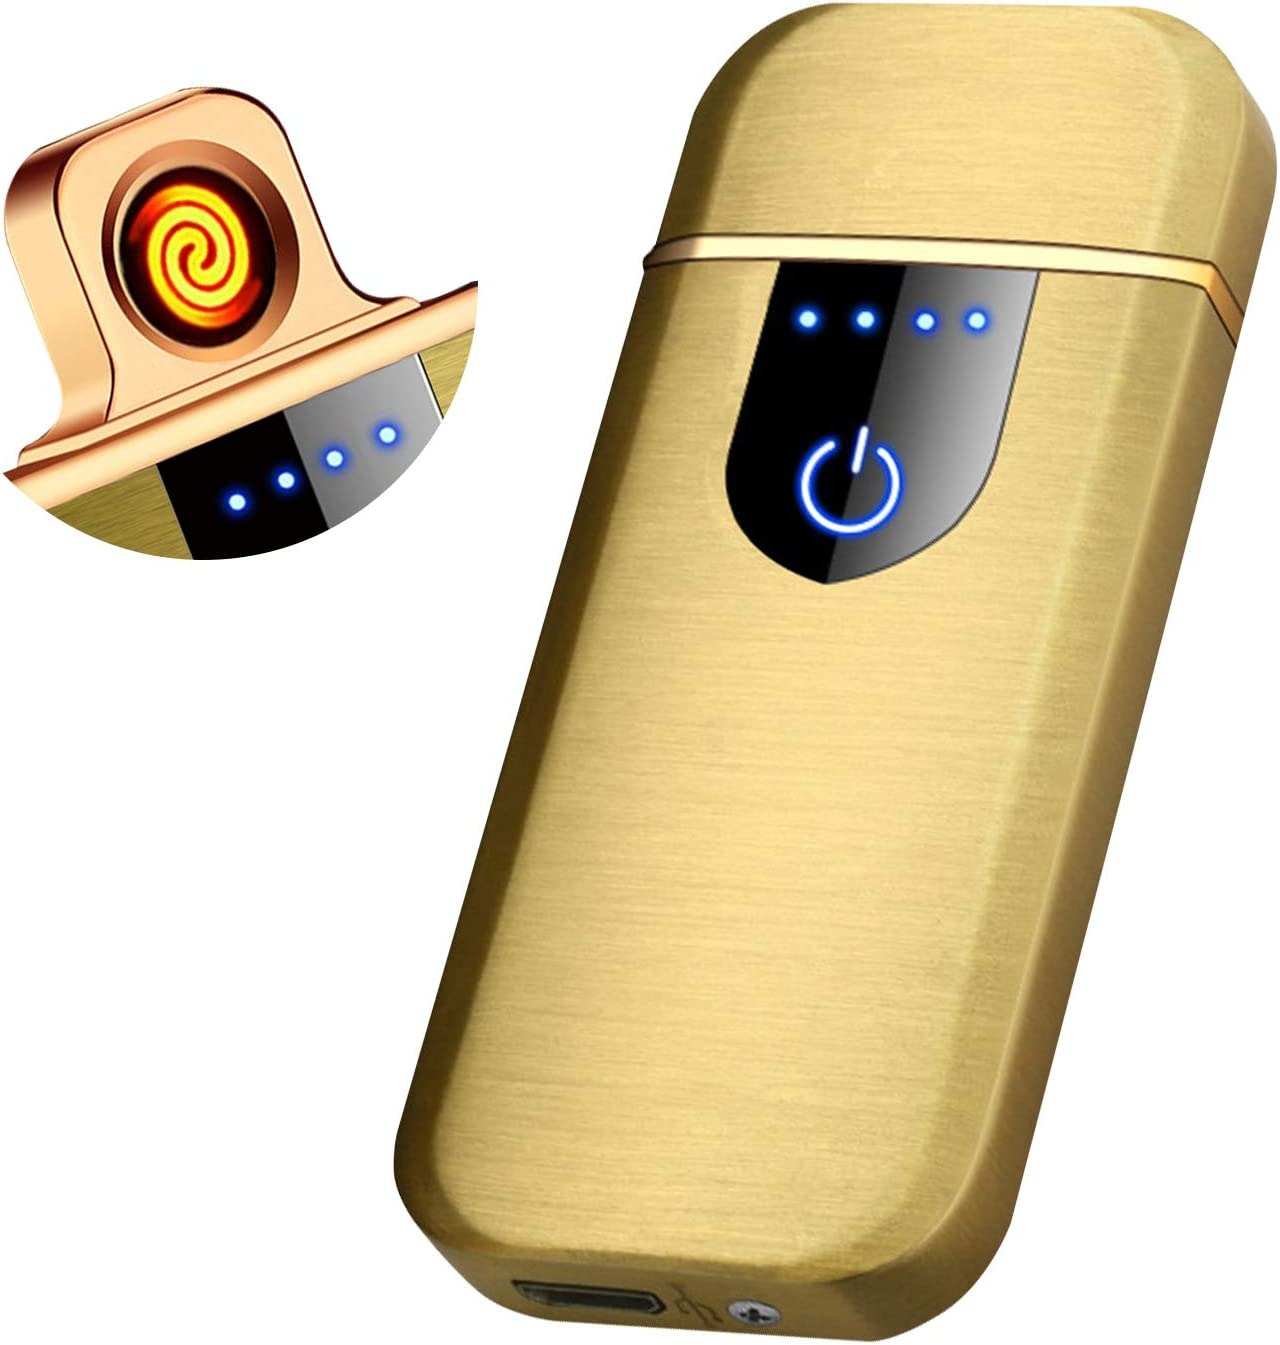 Auratrio Y26 Mechero eléctrico de Arco eléctrico, Plasma ARC Lighter, Recargable, Pantalla táctil electrónica, Llama Impermeable al Viento para ...